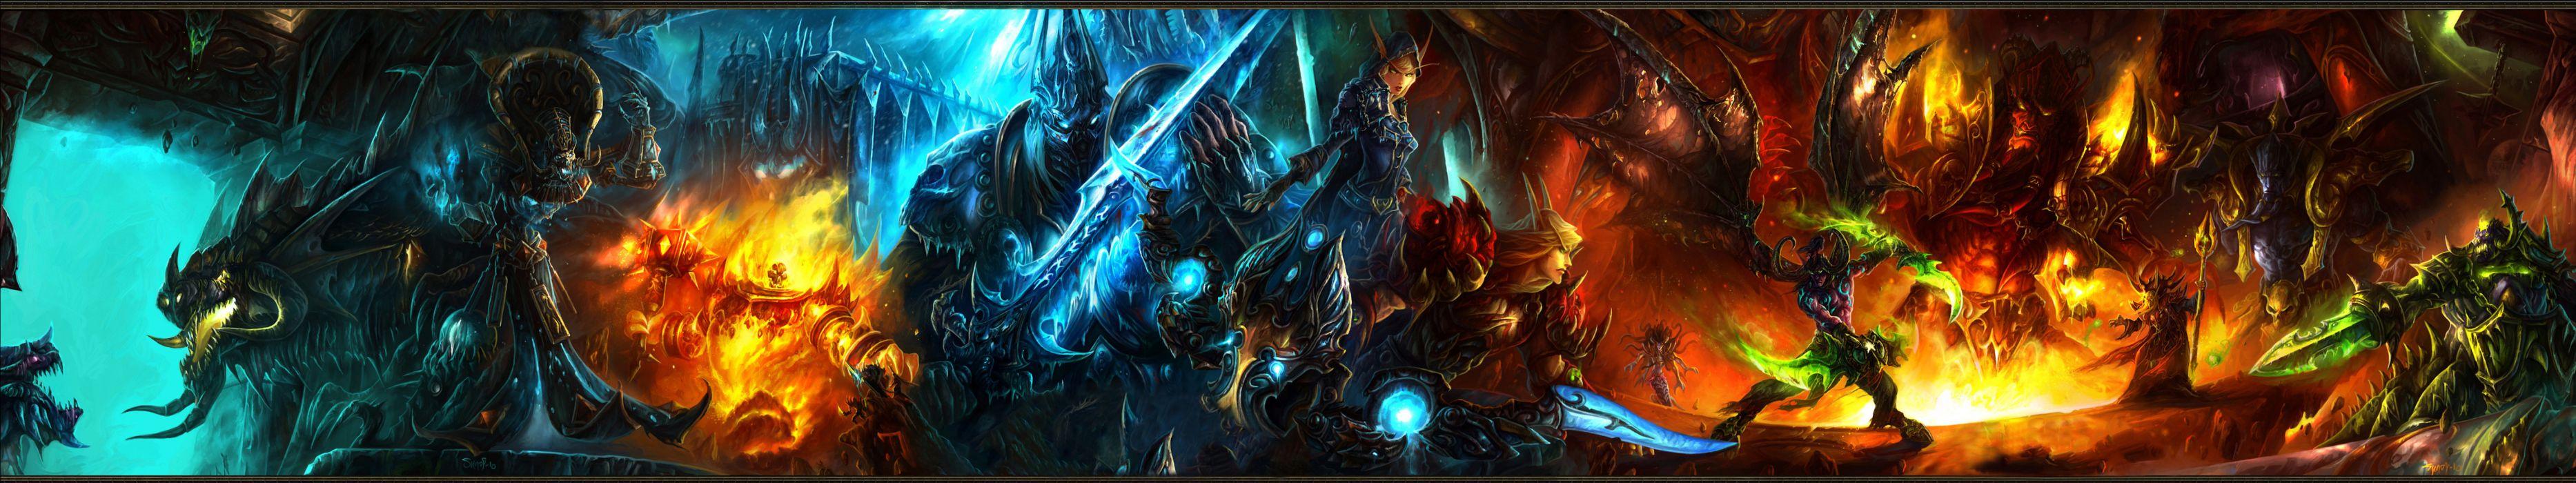 warhammer Monitor Dual Screen fantasy warriors battles weapons sword wallpaper